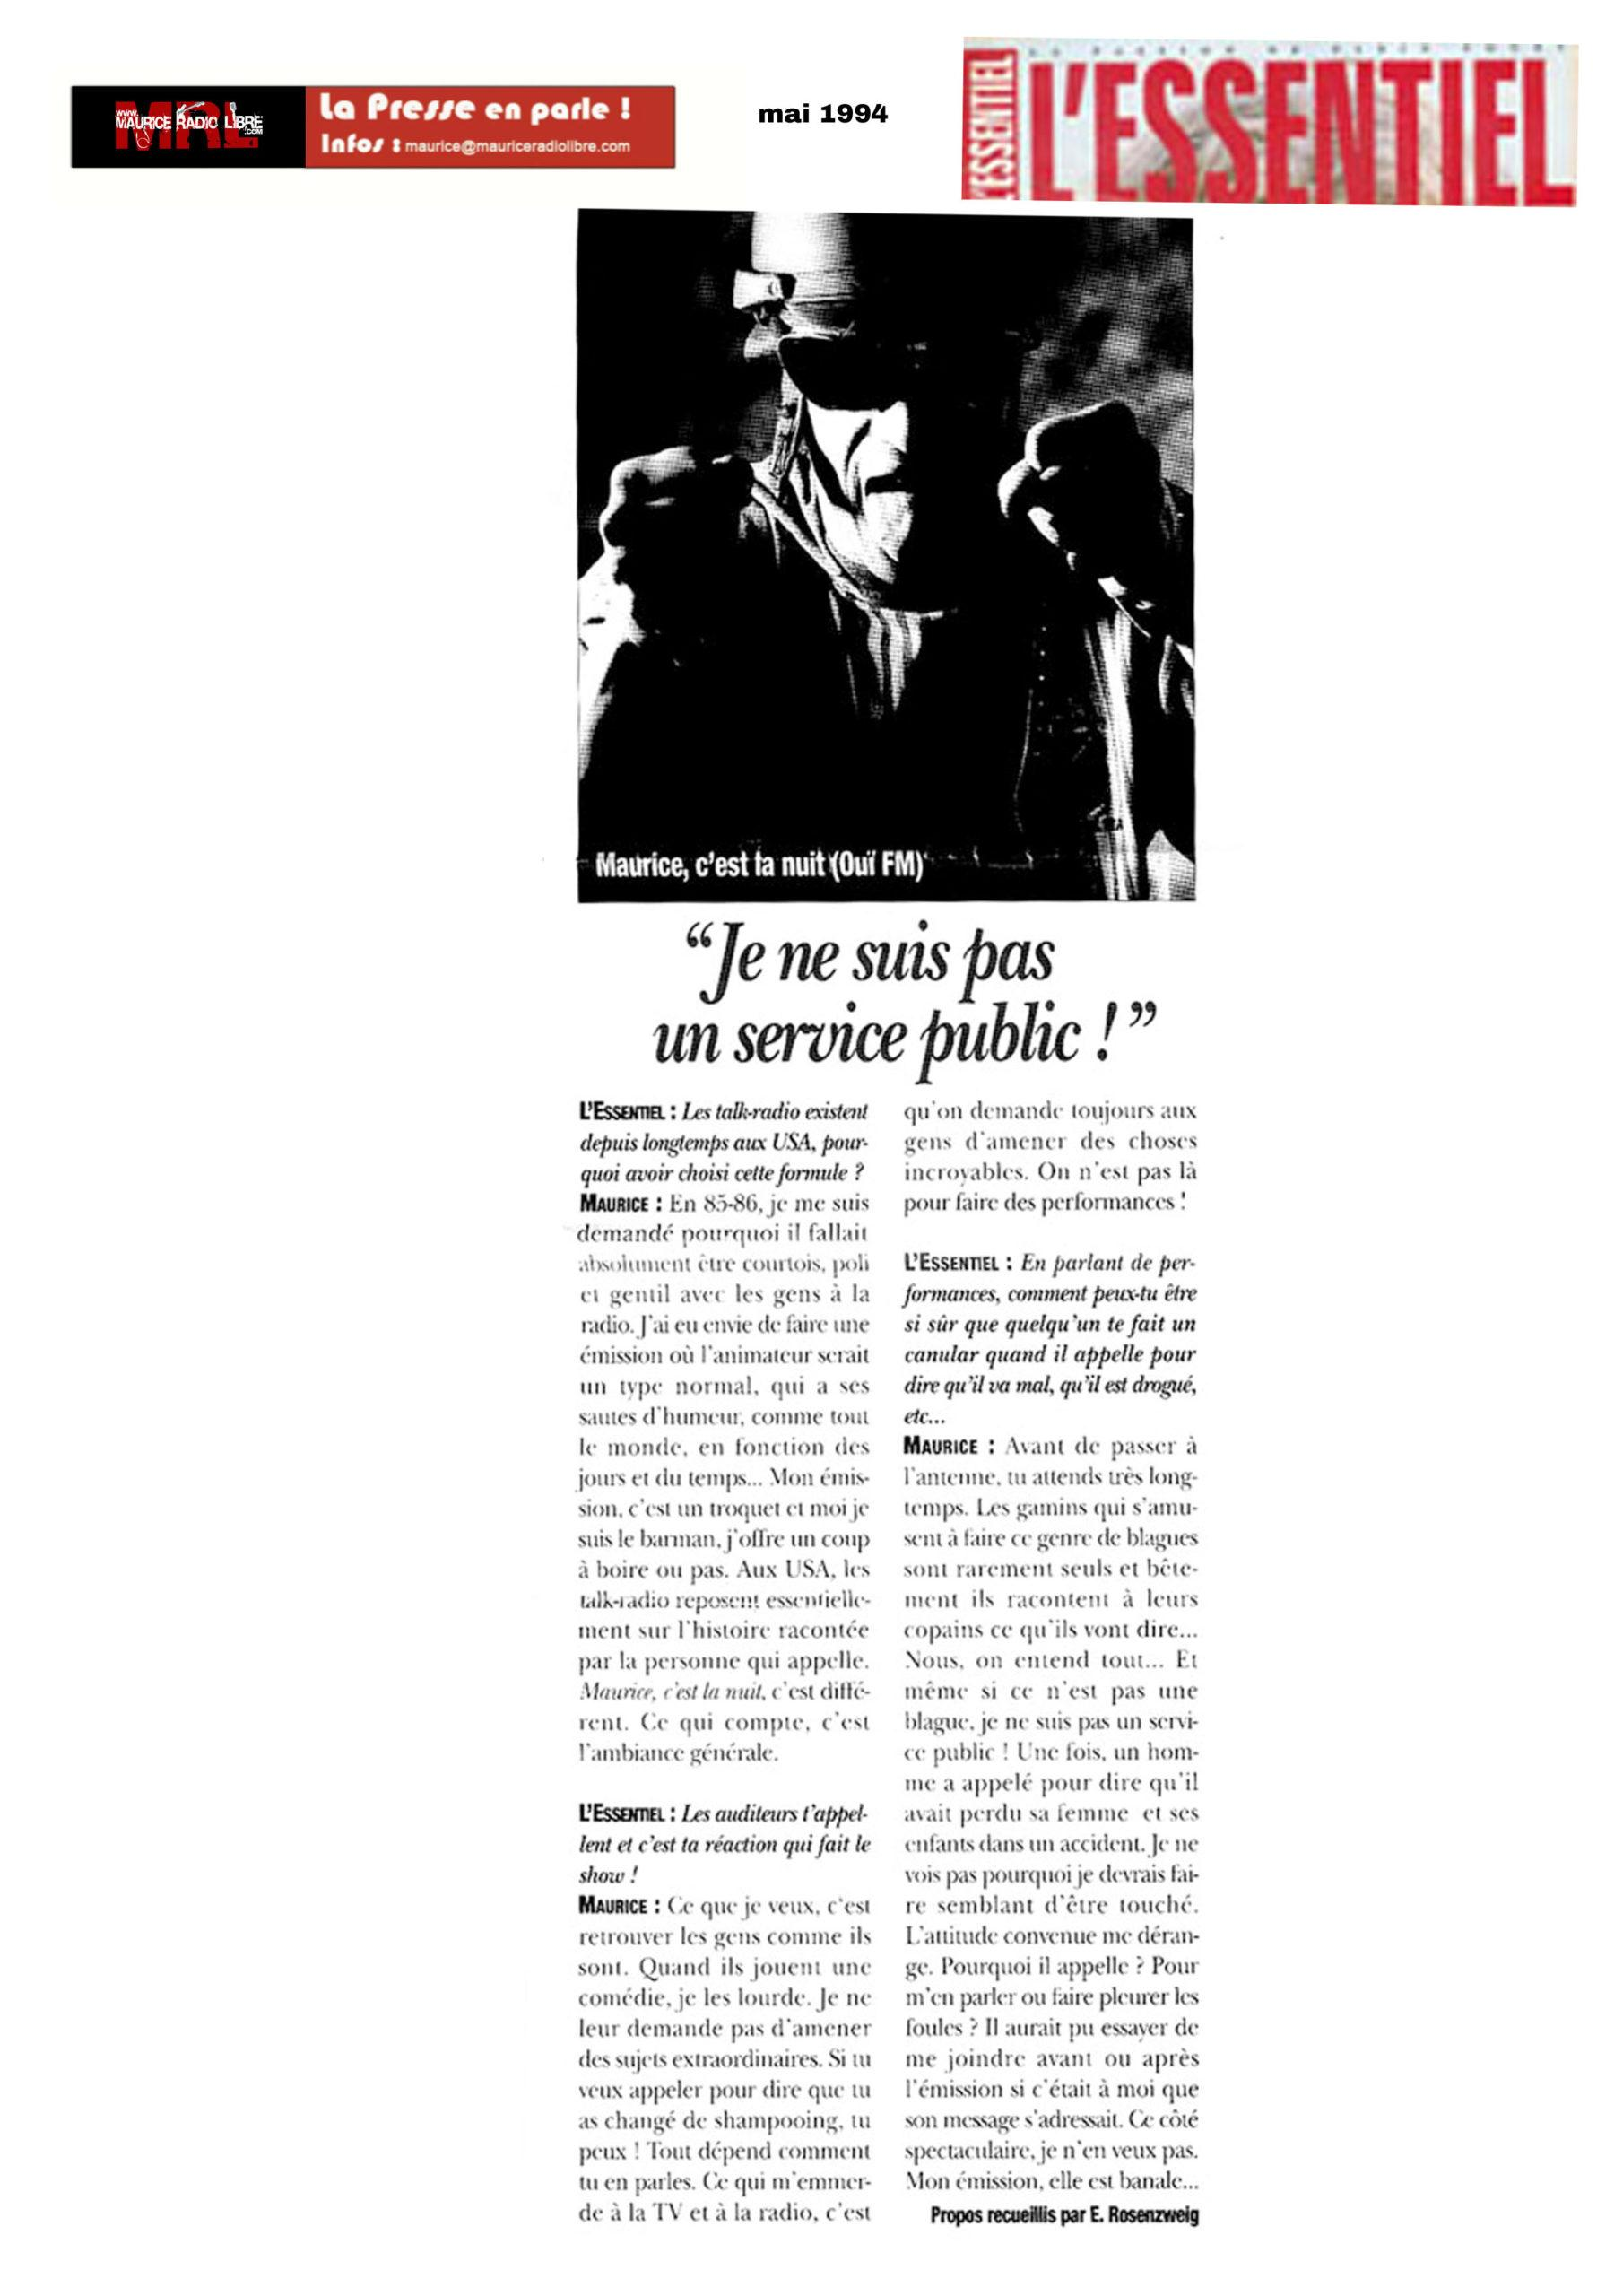 vignette L'ESSENTIEL